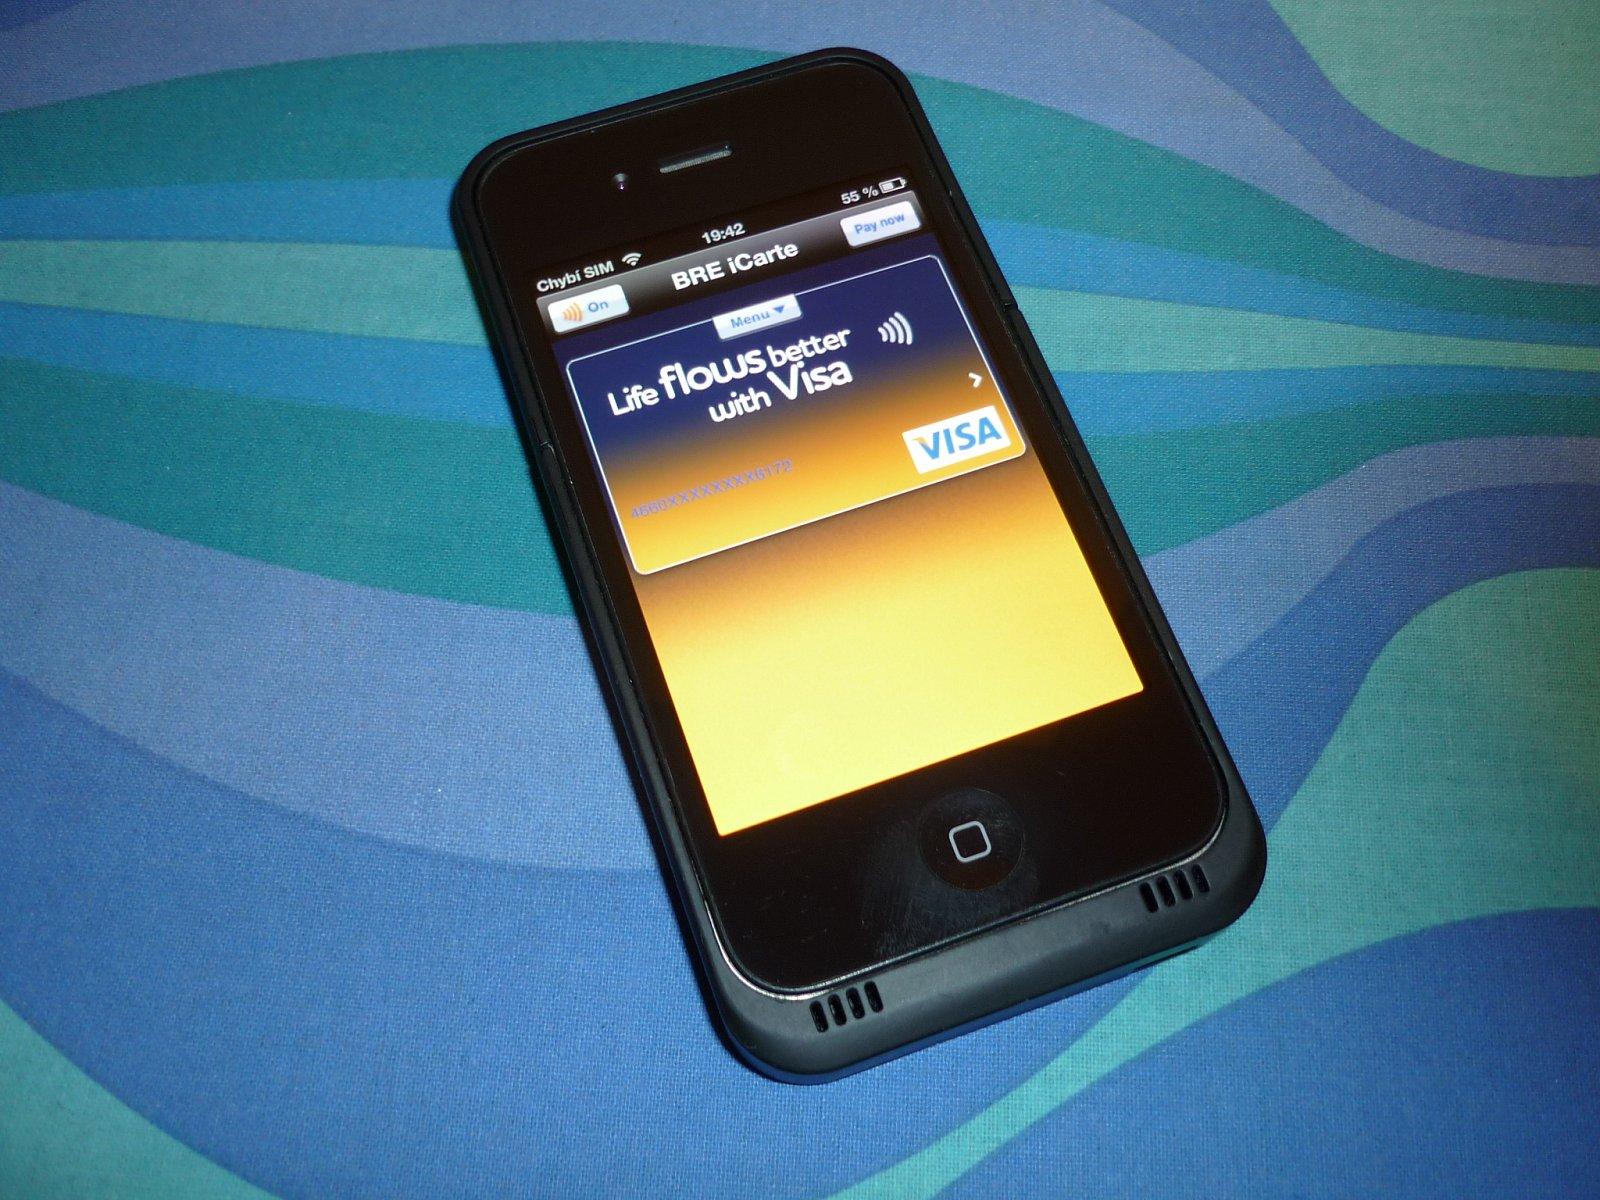 iPhone 4 + iCarte: Debetní karta Visa